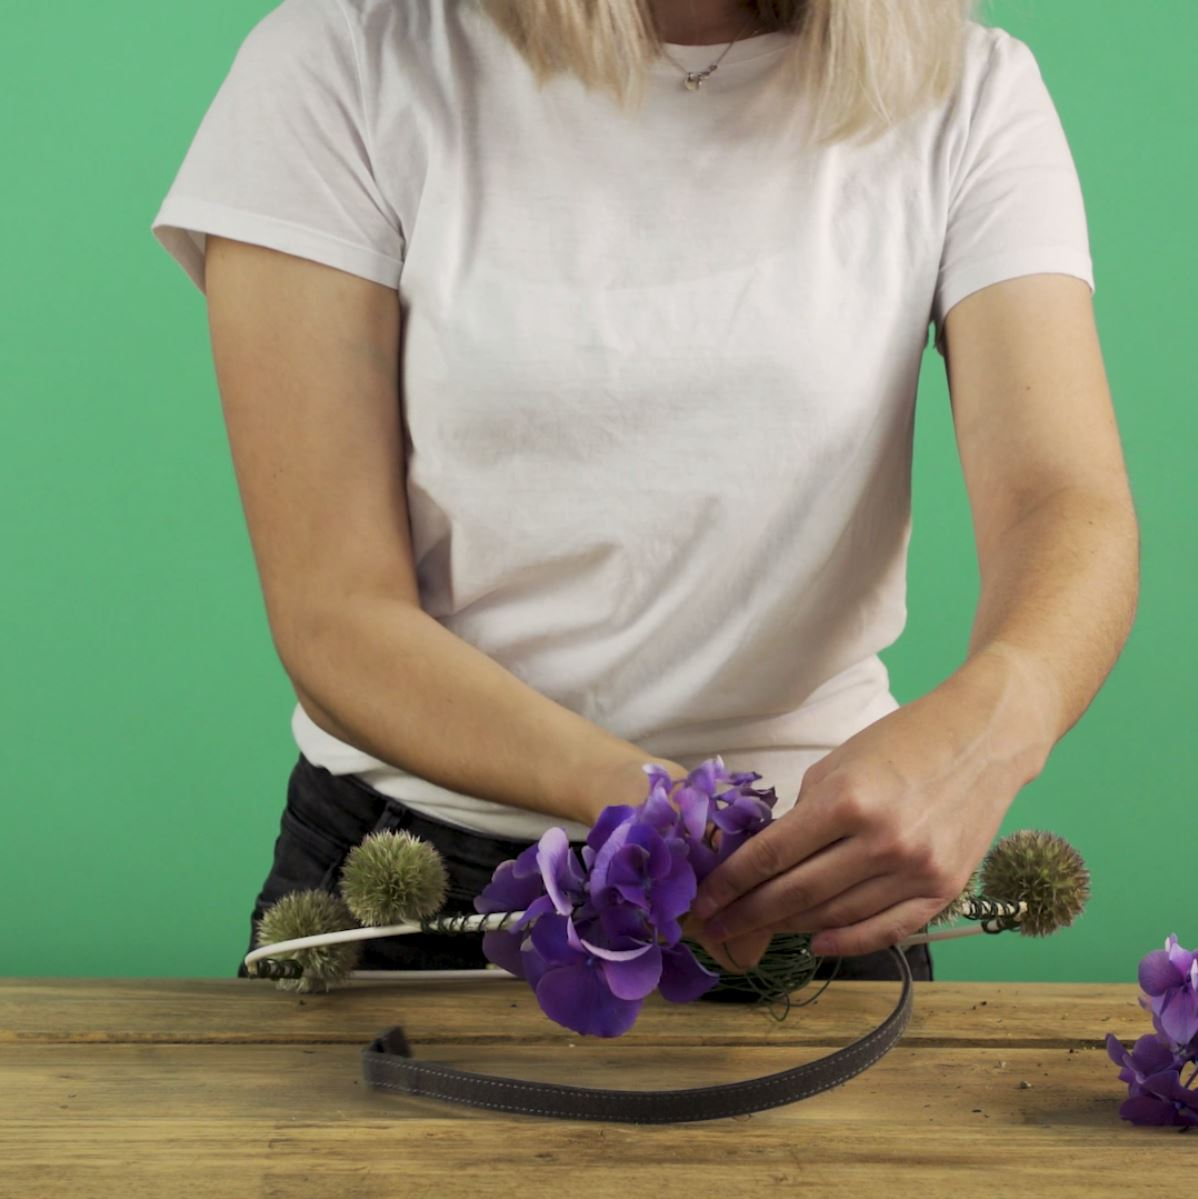 DIY Hortensiakrans stap 4: Hortensia bevestigen